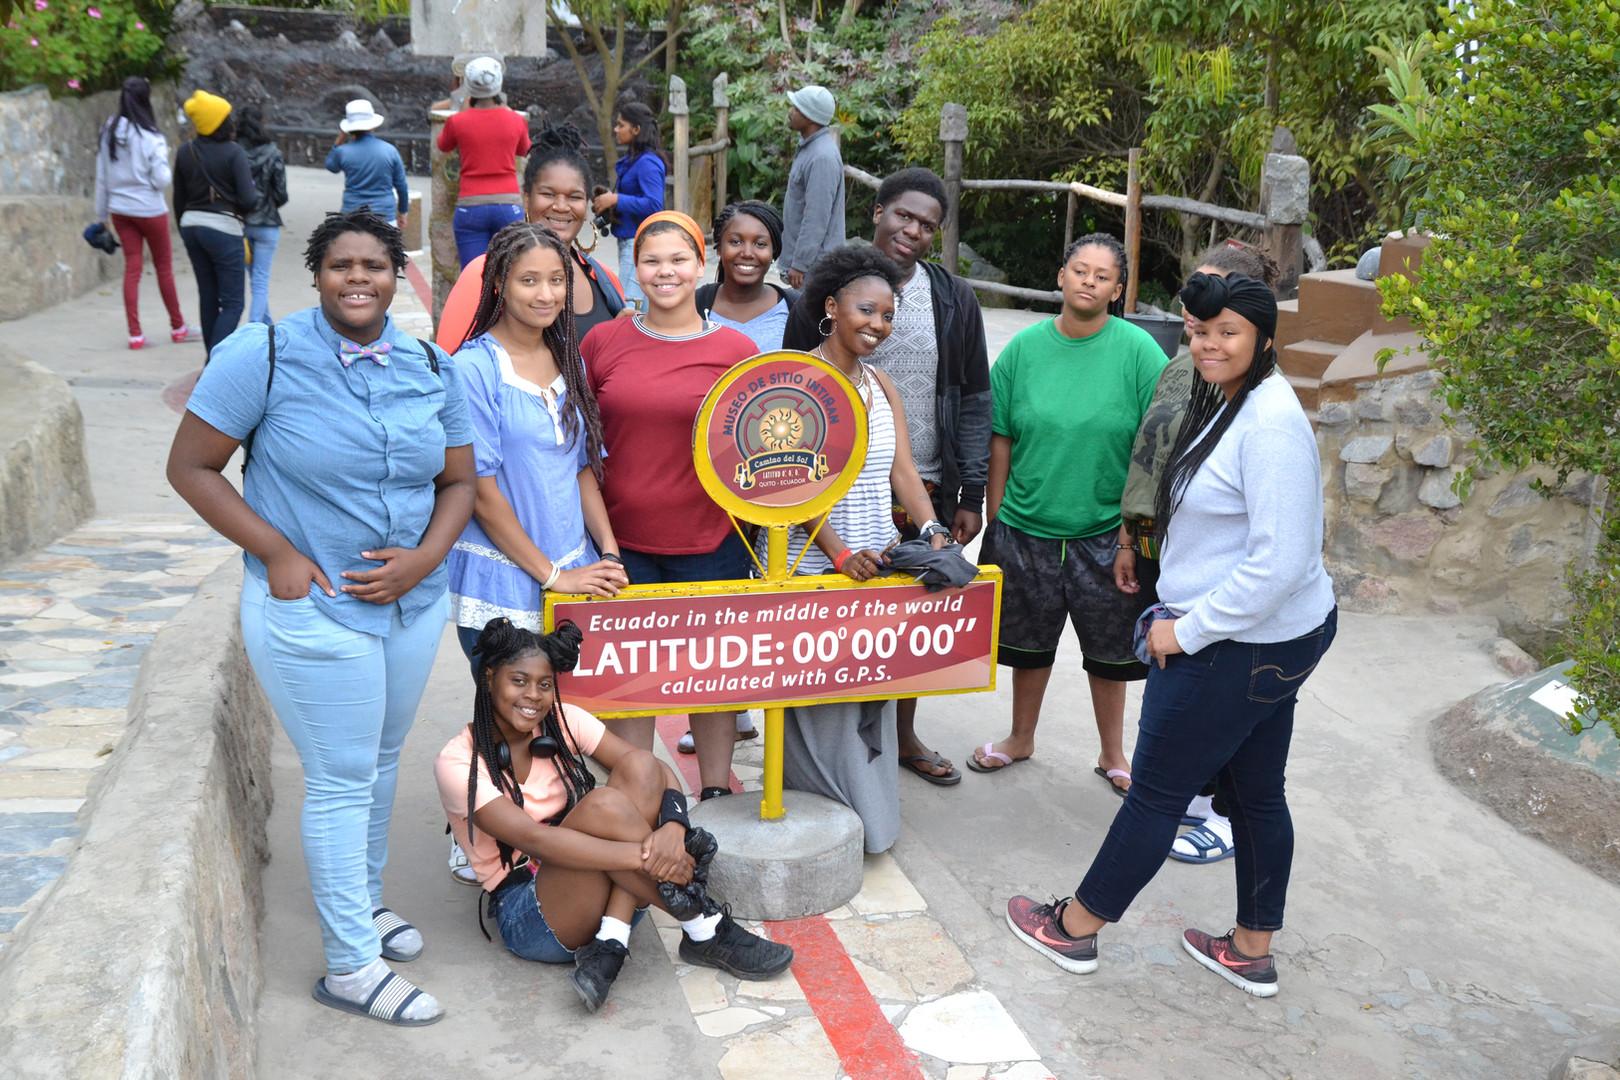 Trip to the Equator in Ecuador